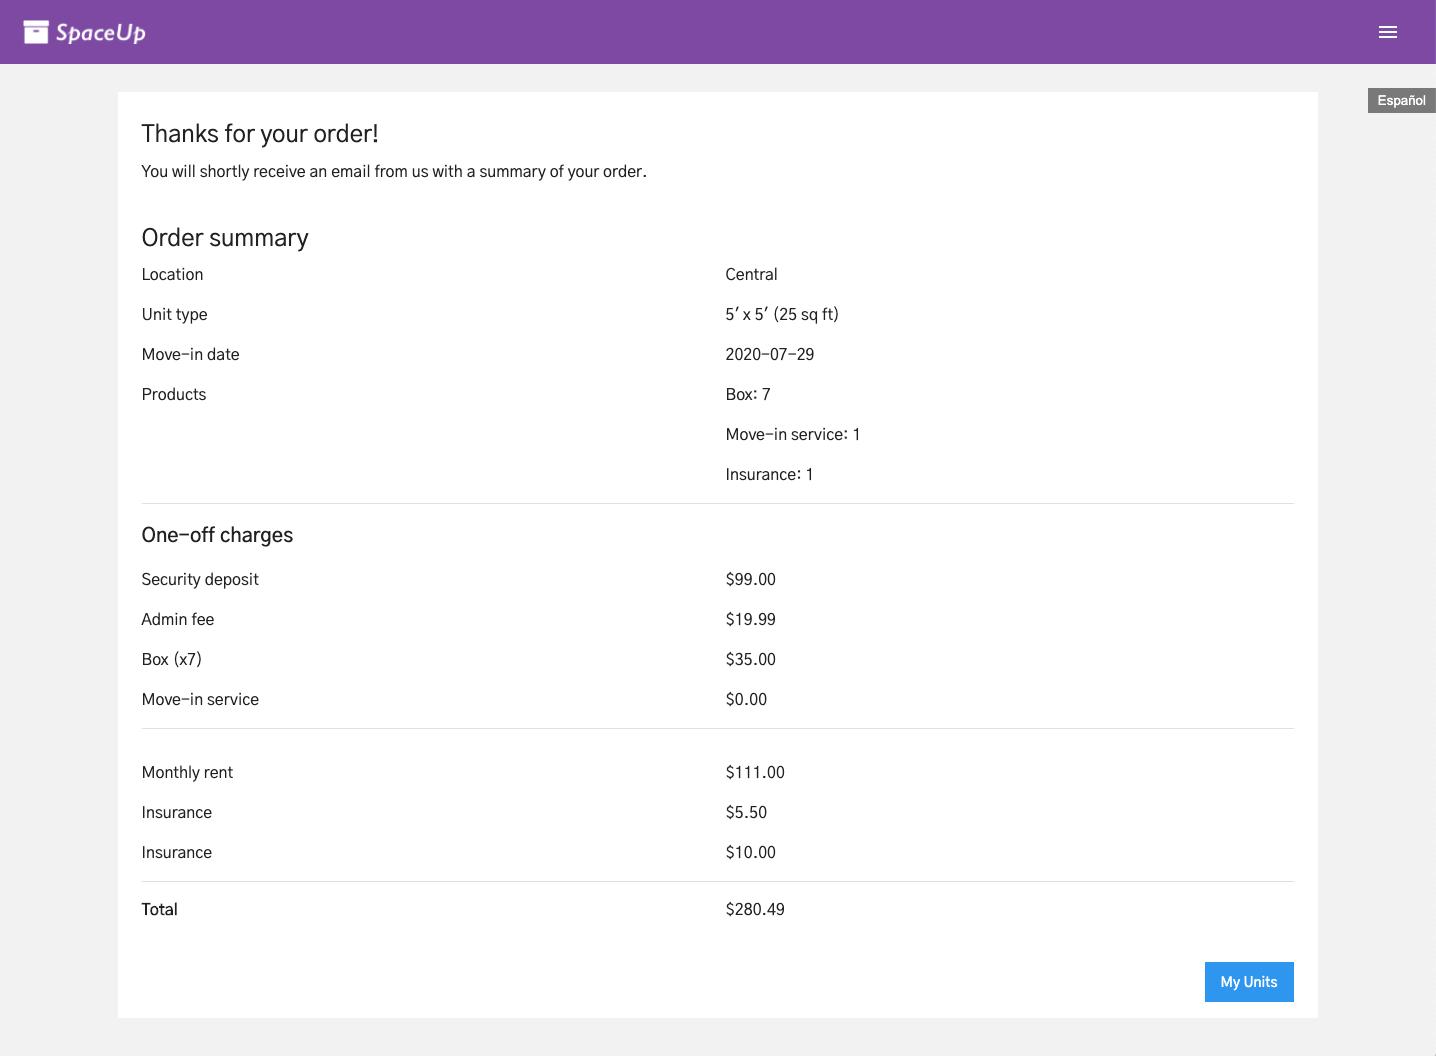 Units Customer App: Order confirmation